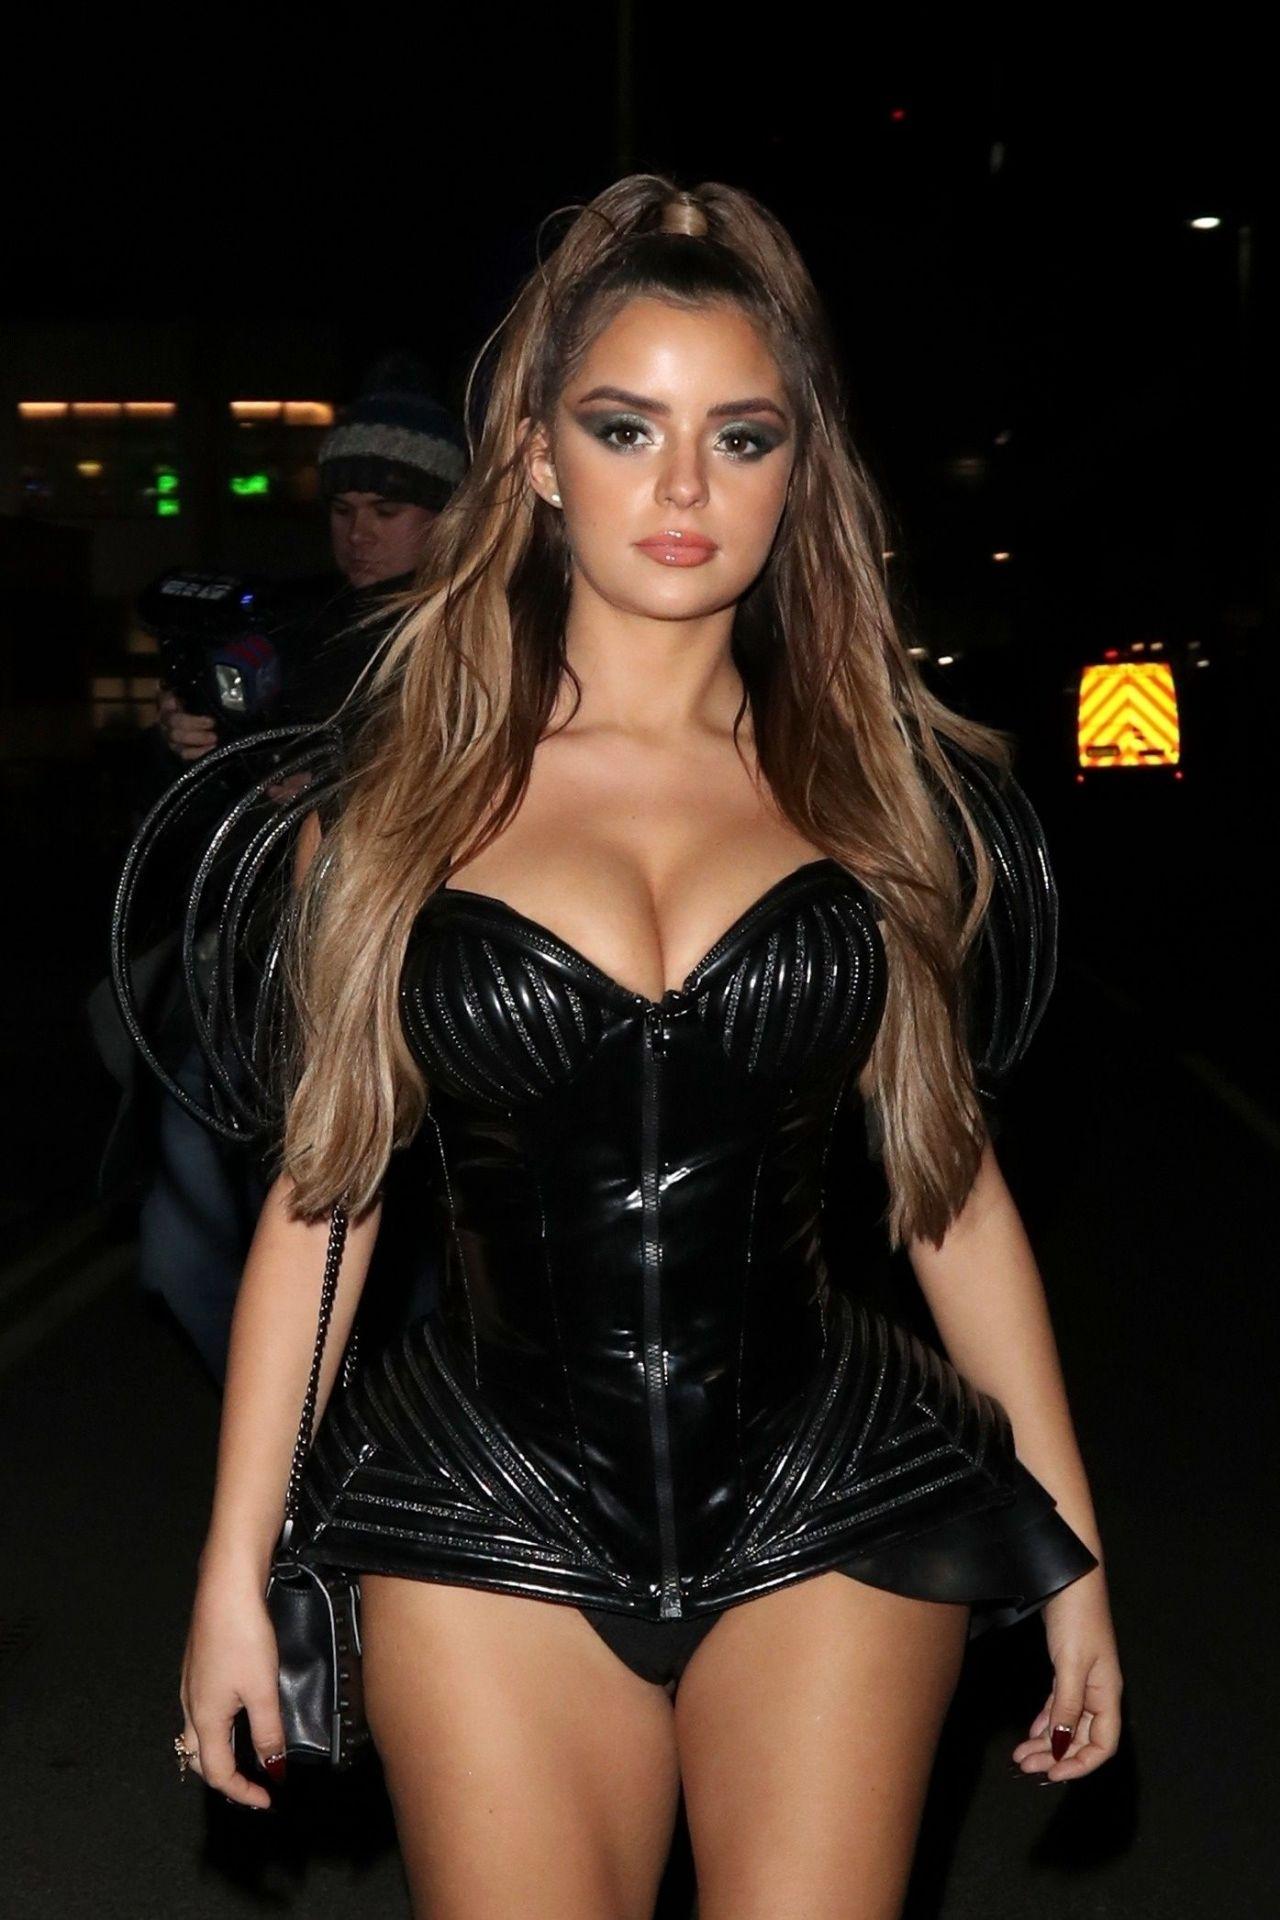 Sexy latex dress out in public in birmingham - 4 8